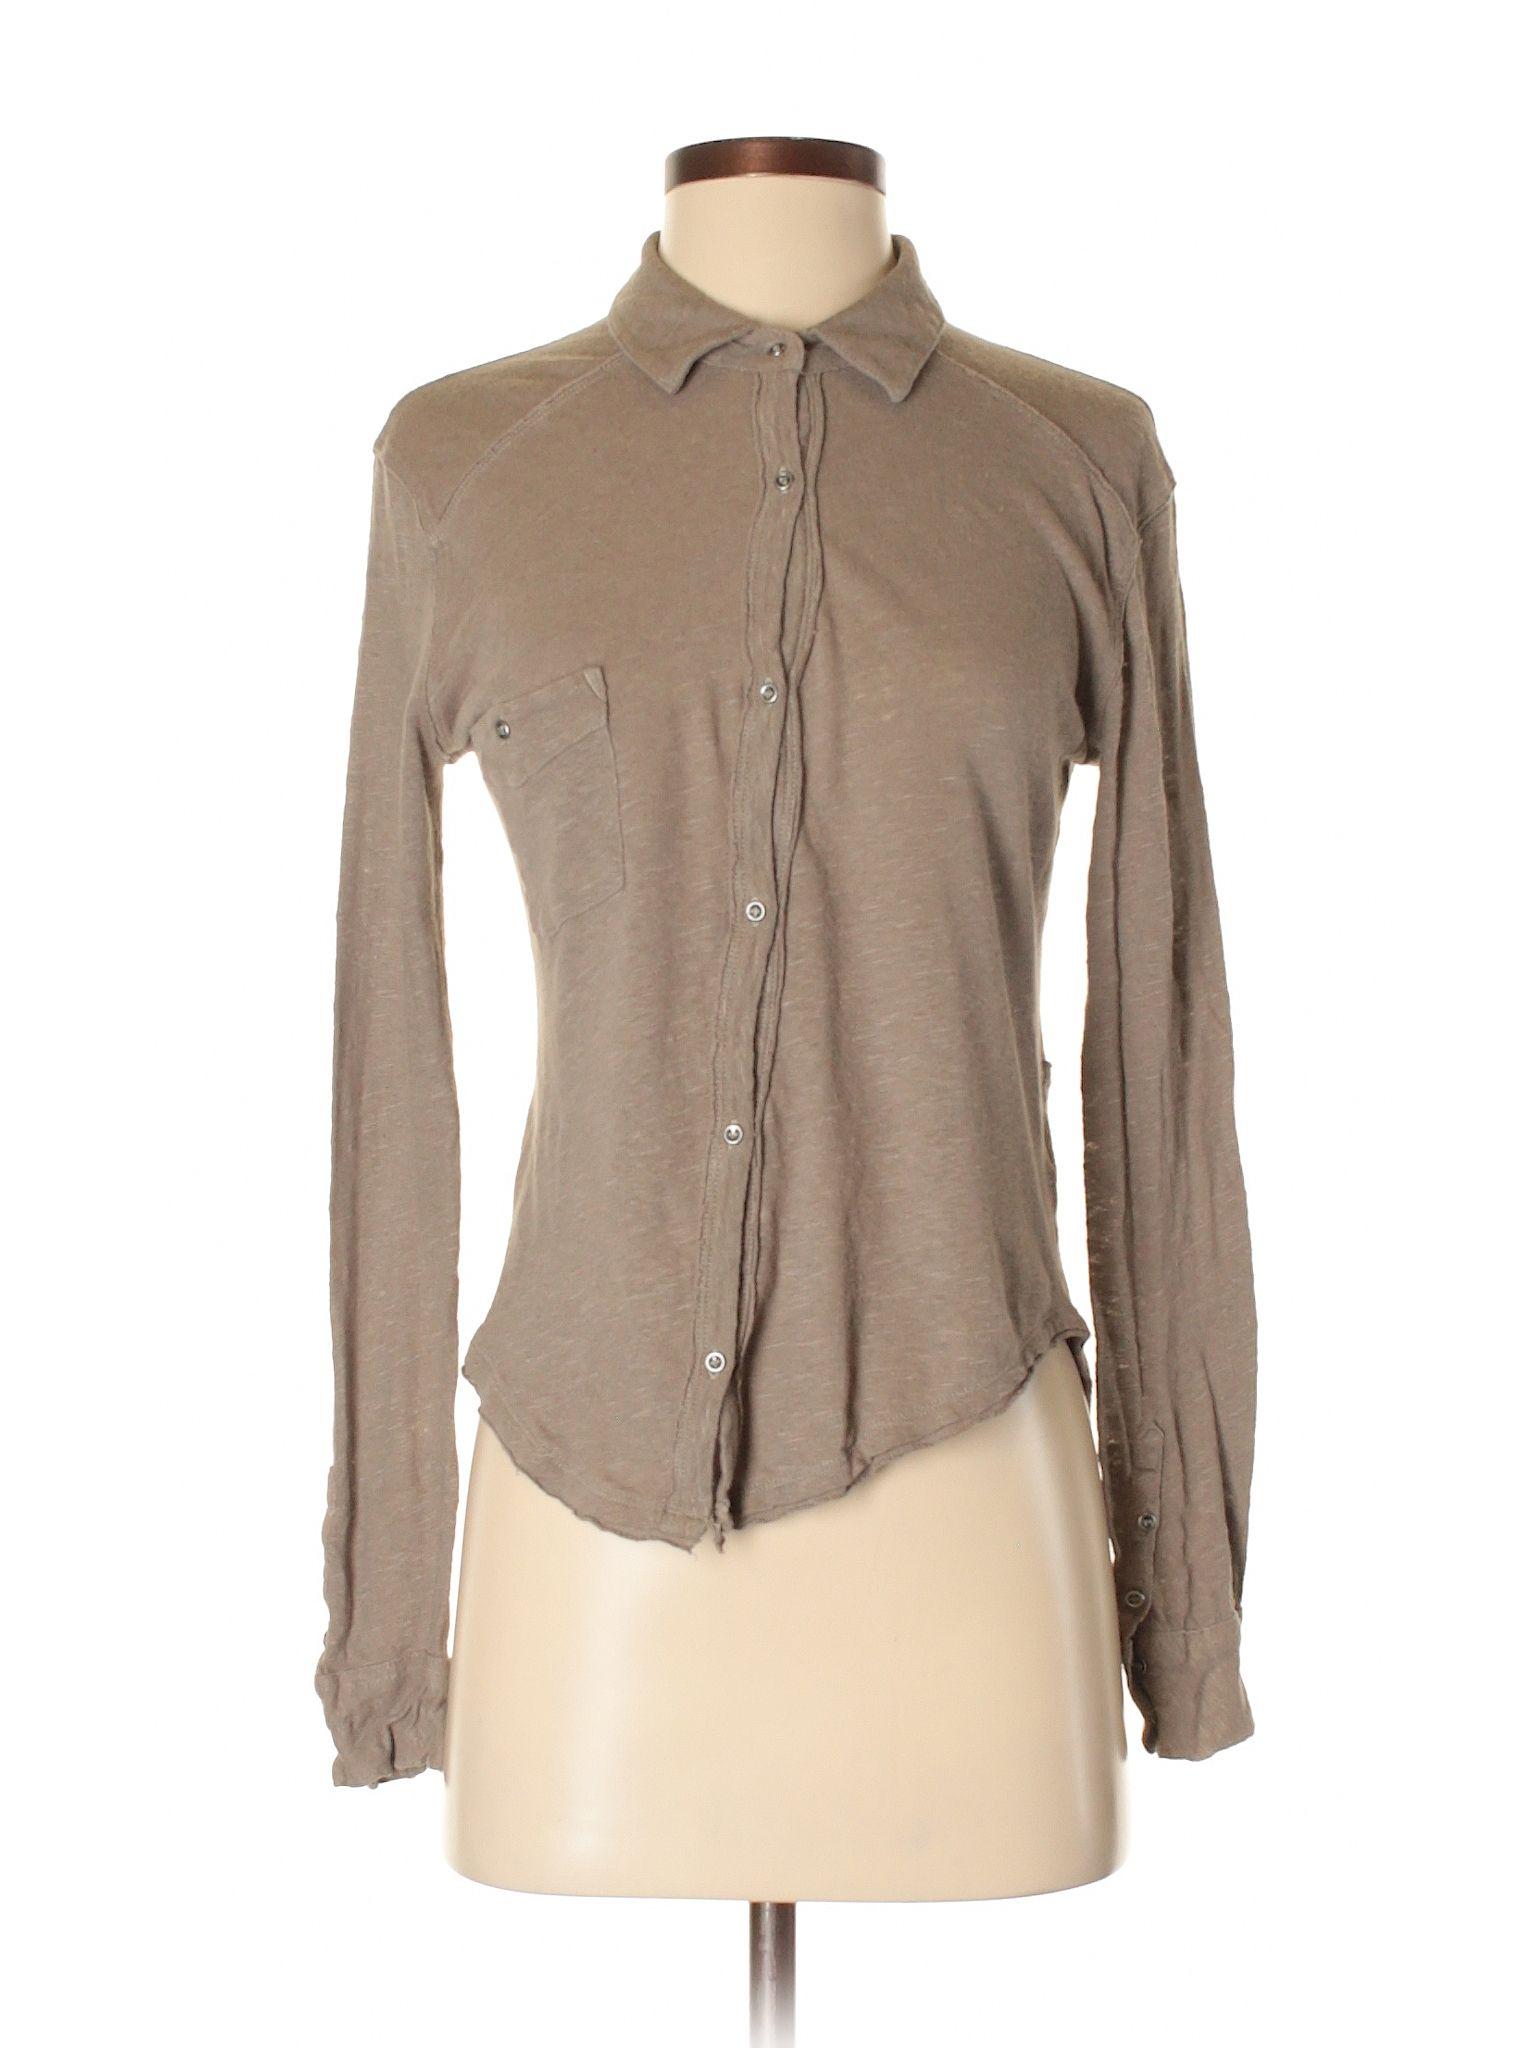 c4ef1084 We the Free Long Sleeve Button Down Shirt: Size 4.00 Tan Women's Tops -  $15.99